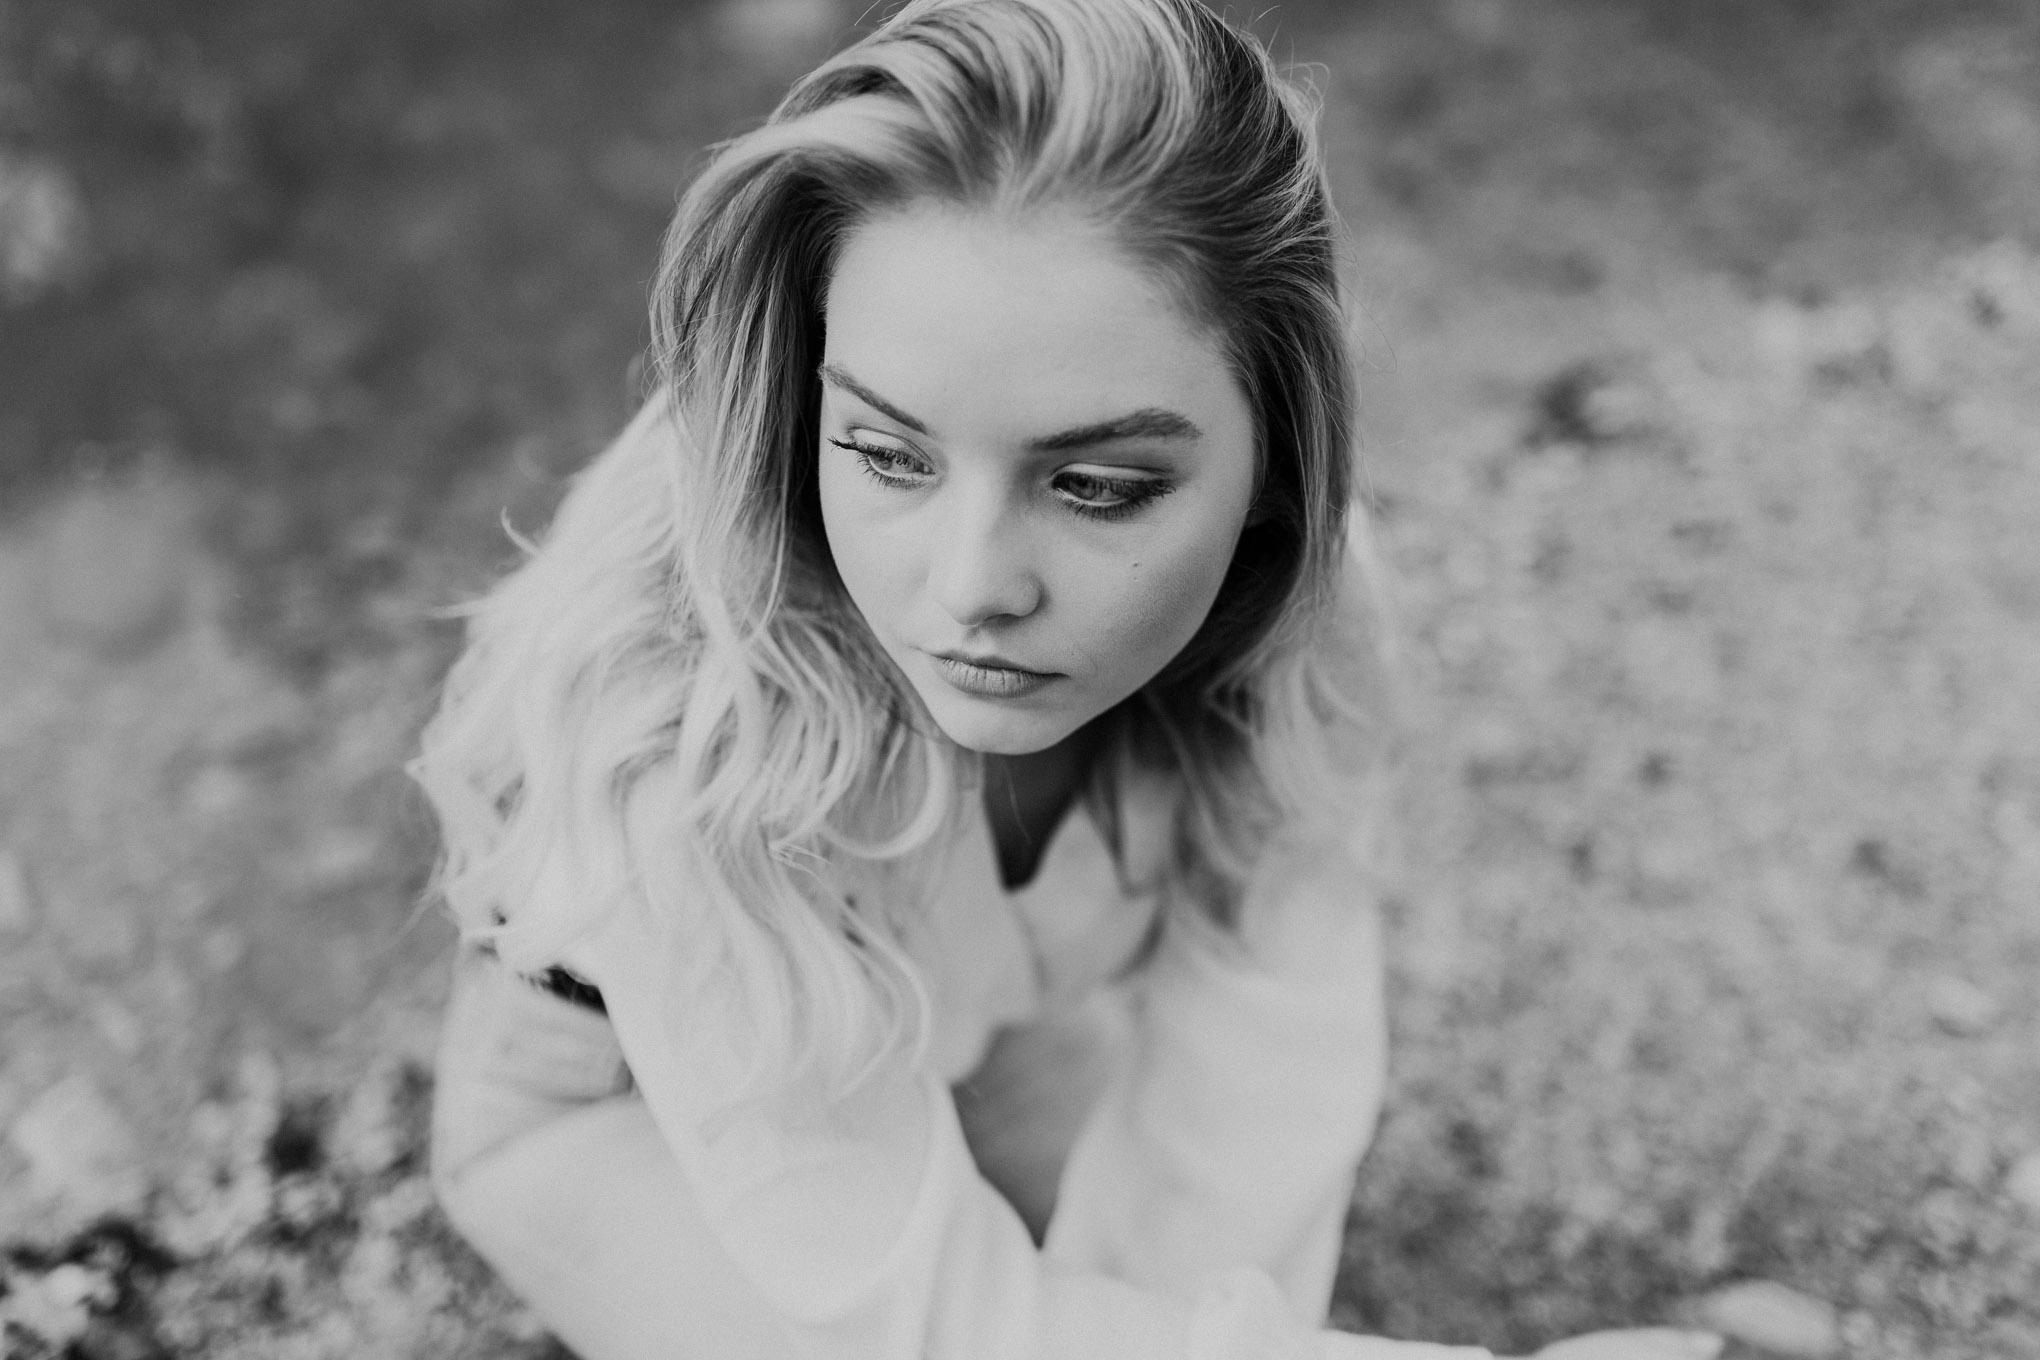 DFW_Senior_Photography_Lily_11.jpg